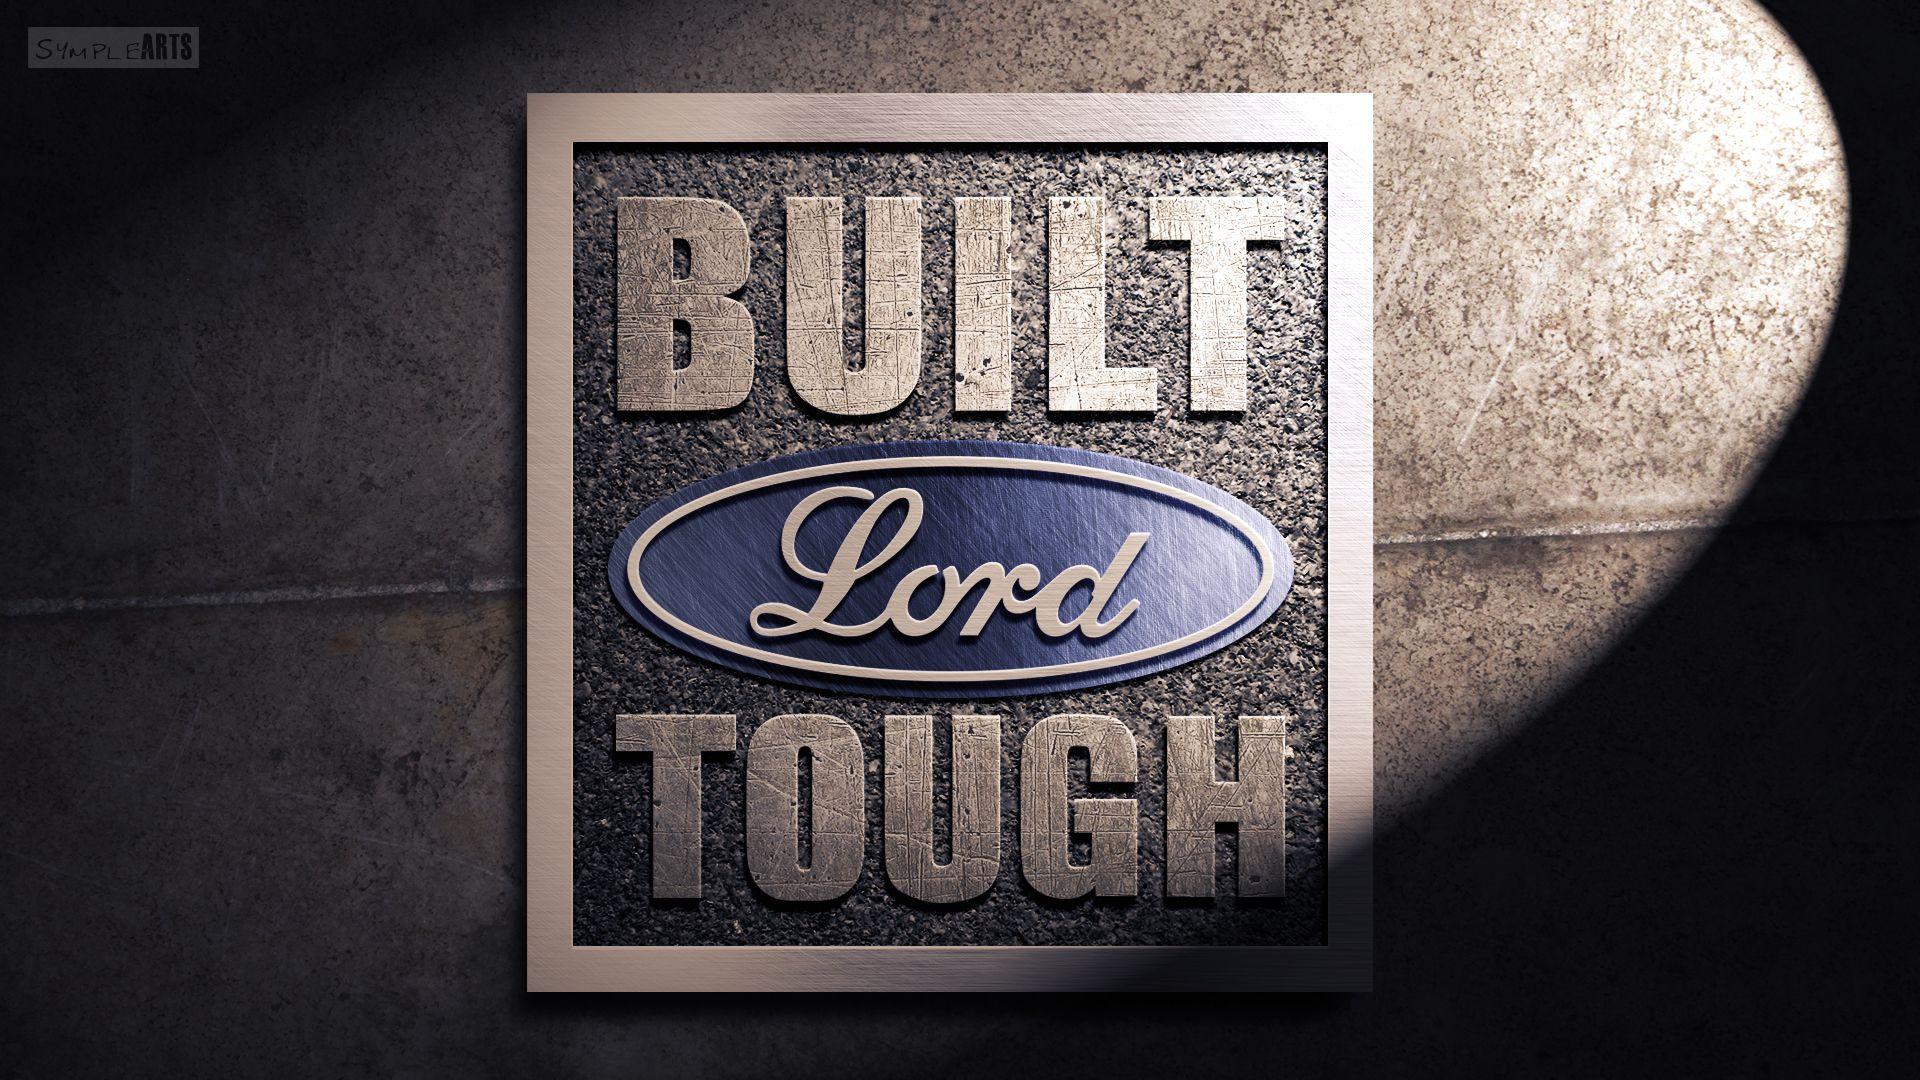 Built Ford Tough Wallpaper